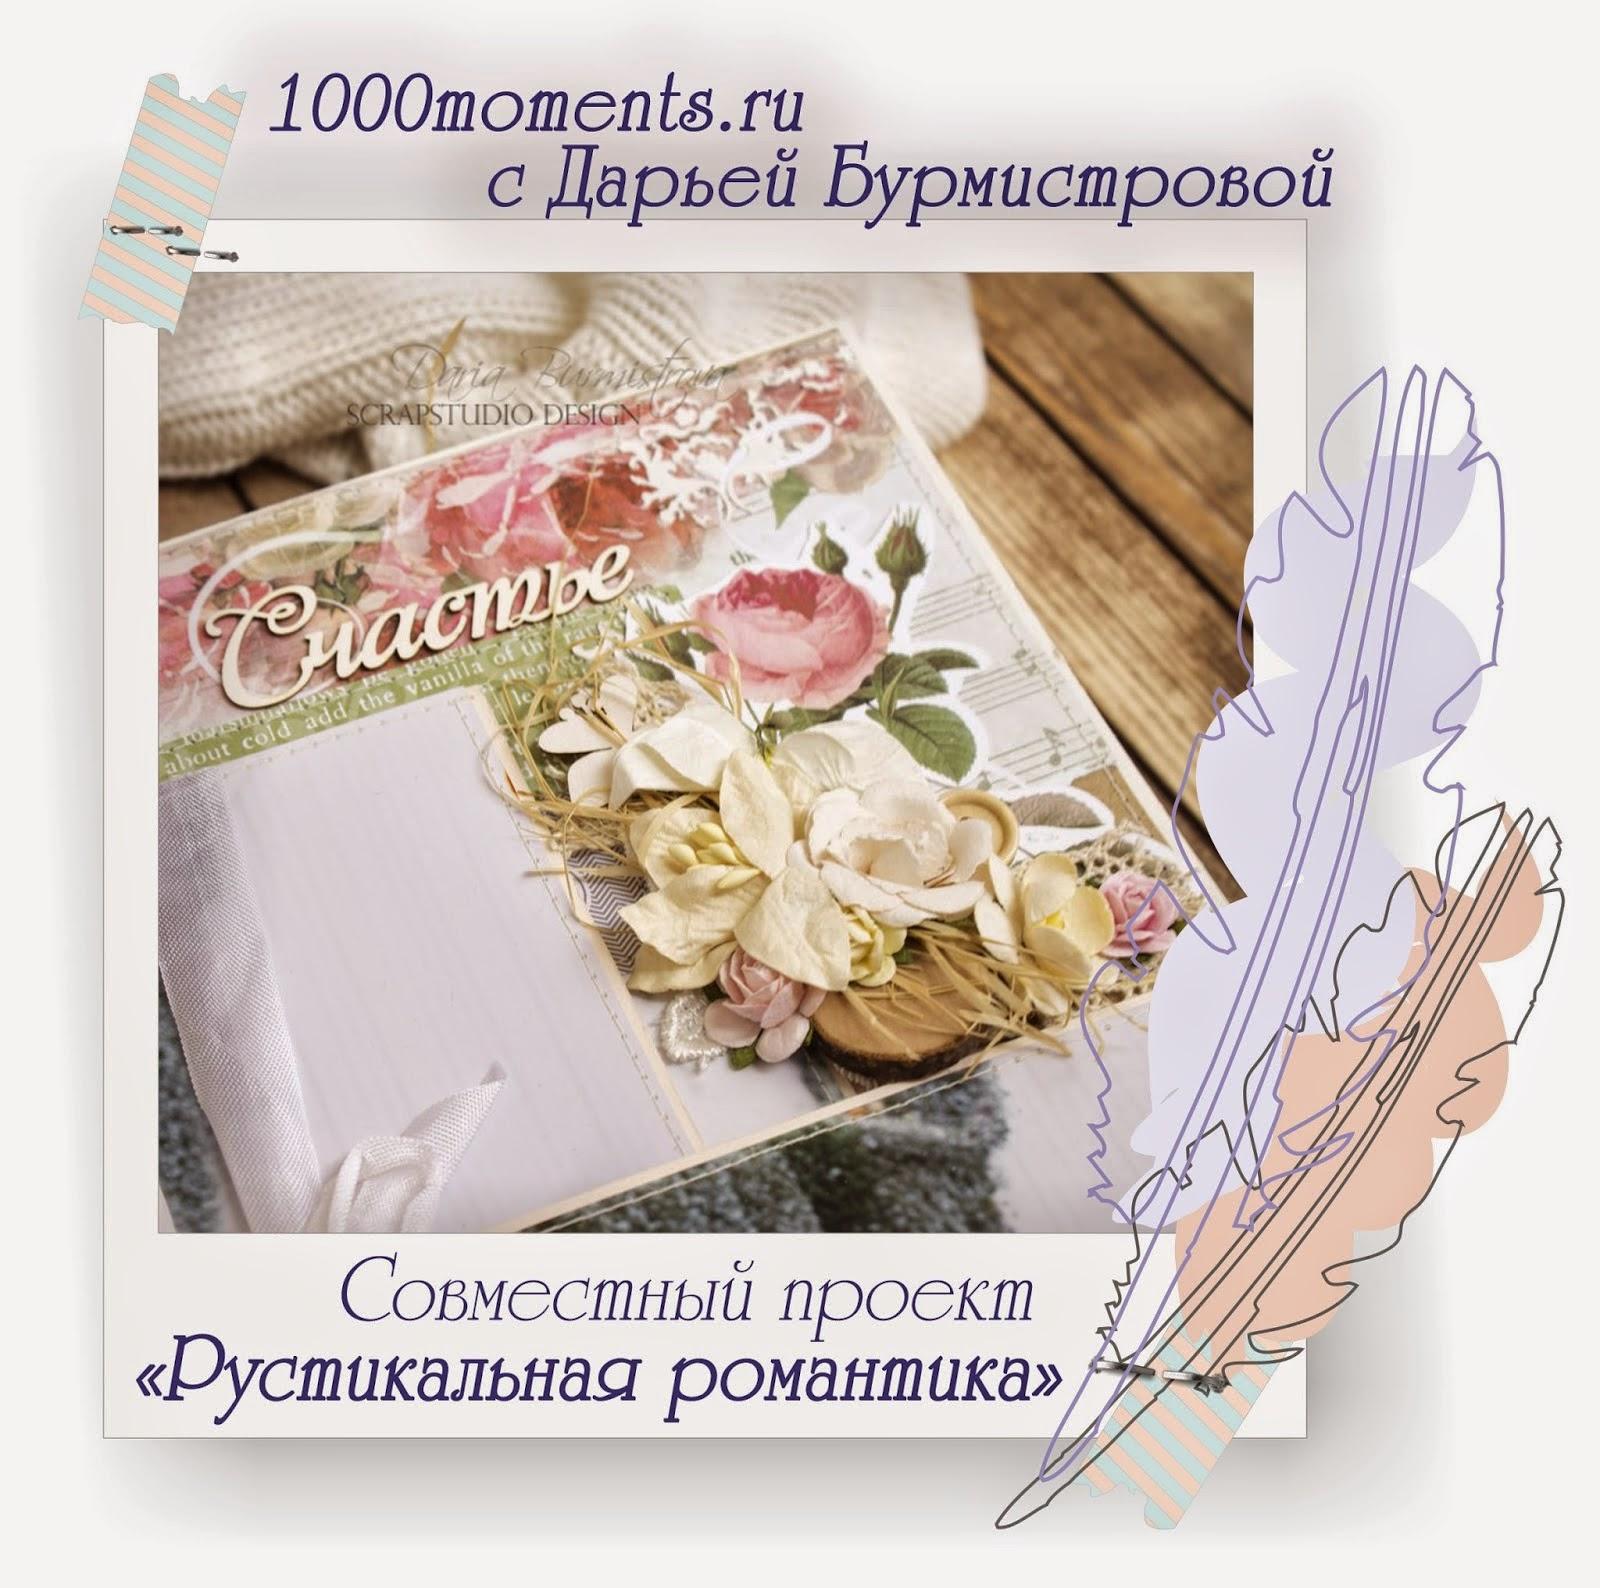 СП Рустикальная романтика